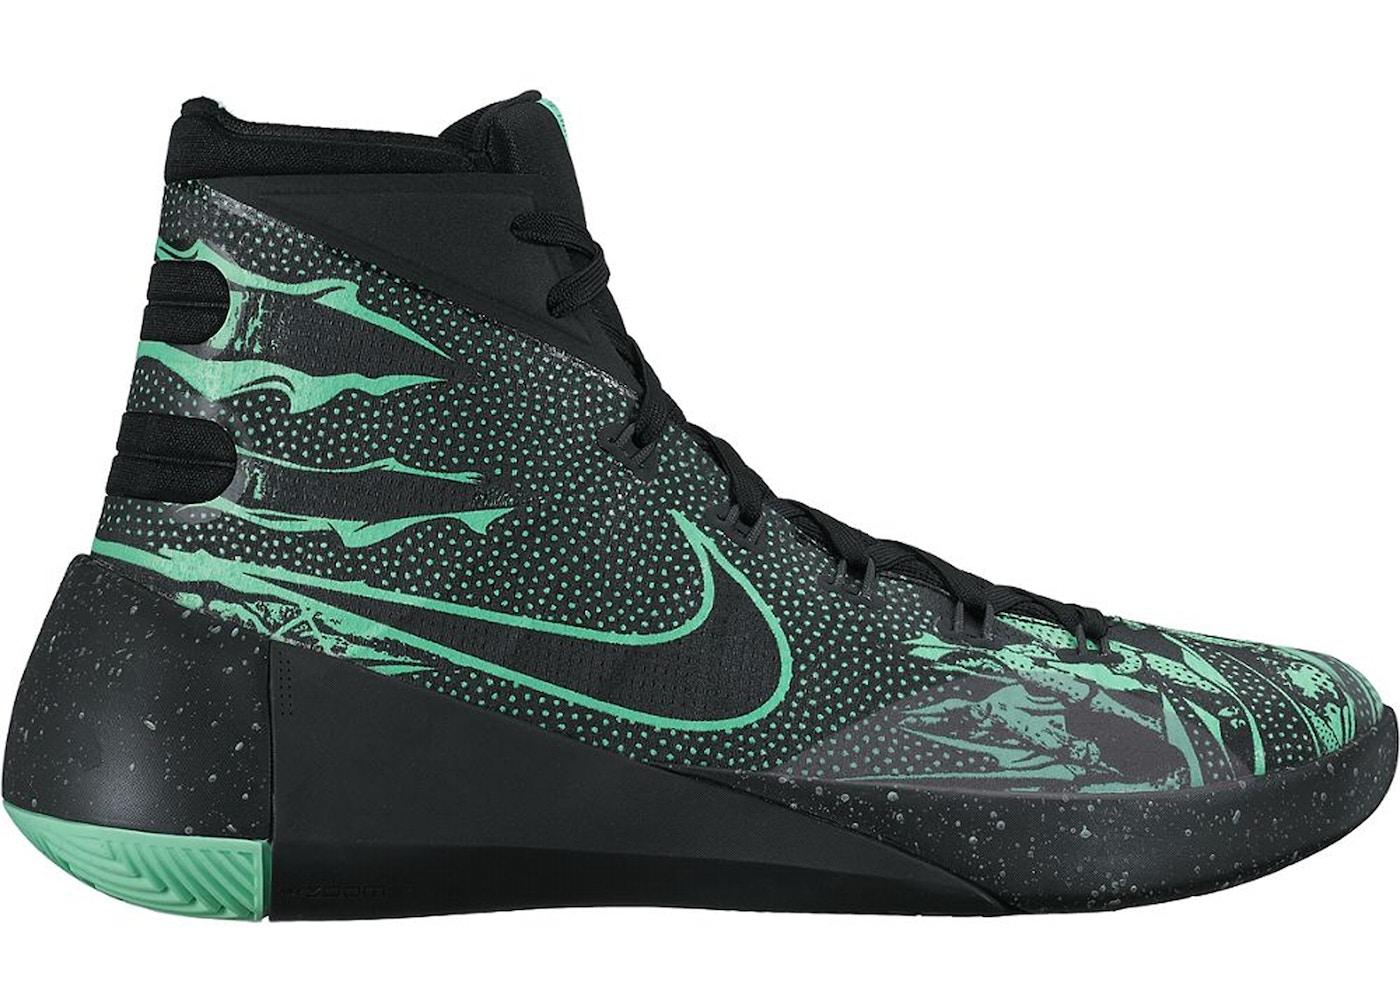 online store c9da4 be56e Nike Hyperdunk 2015 Black Green Glow - 749567-030